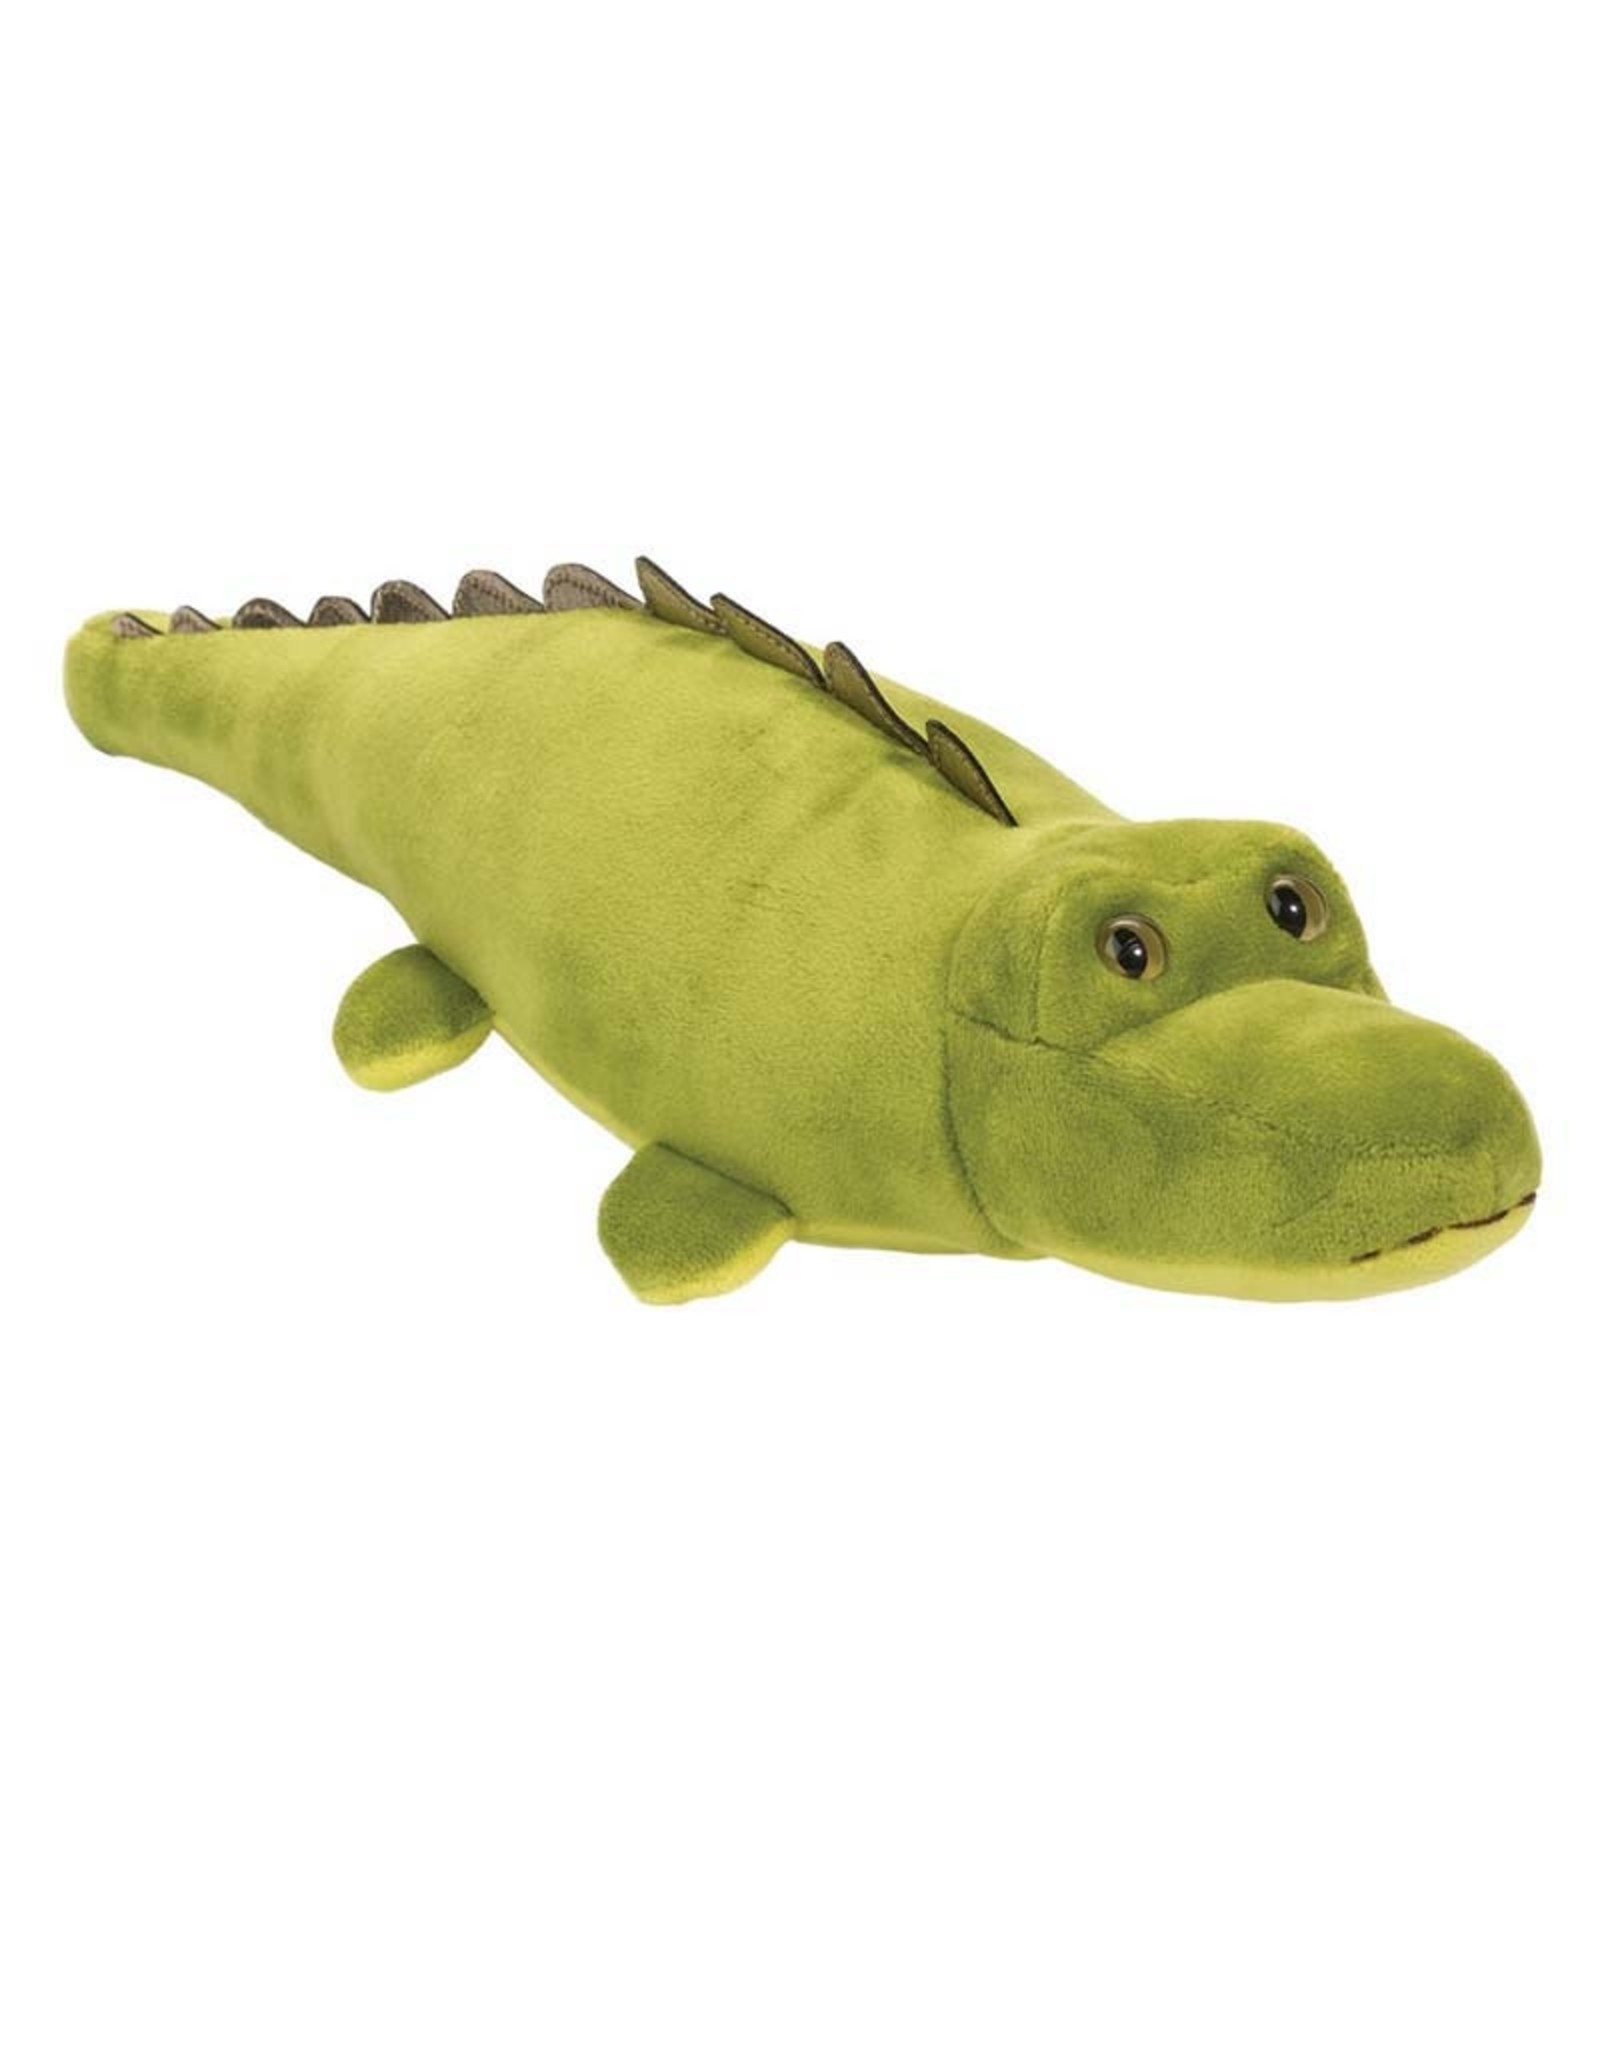 Douglas Alligator Macaroon